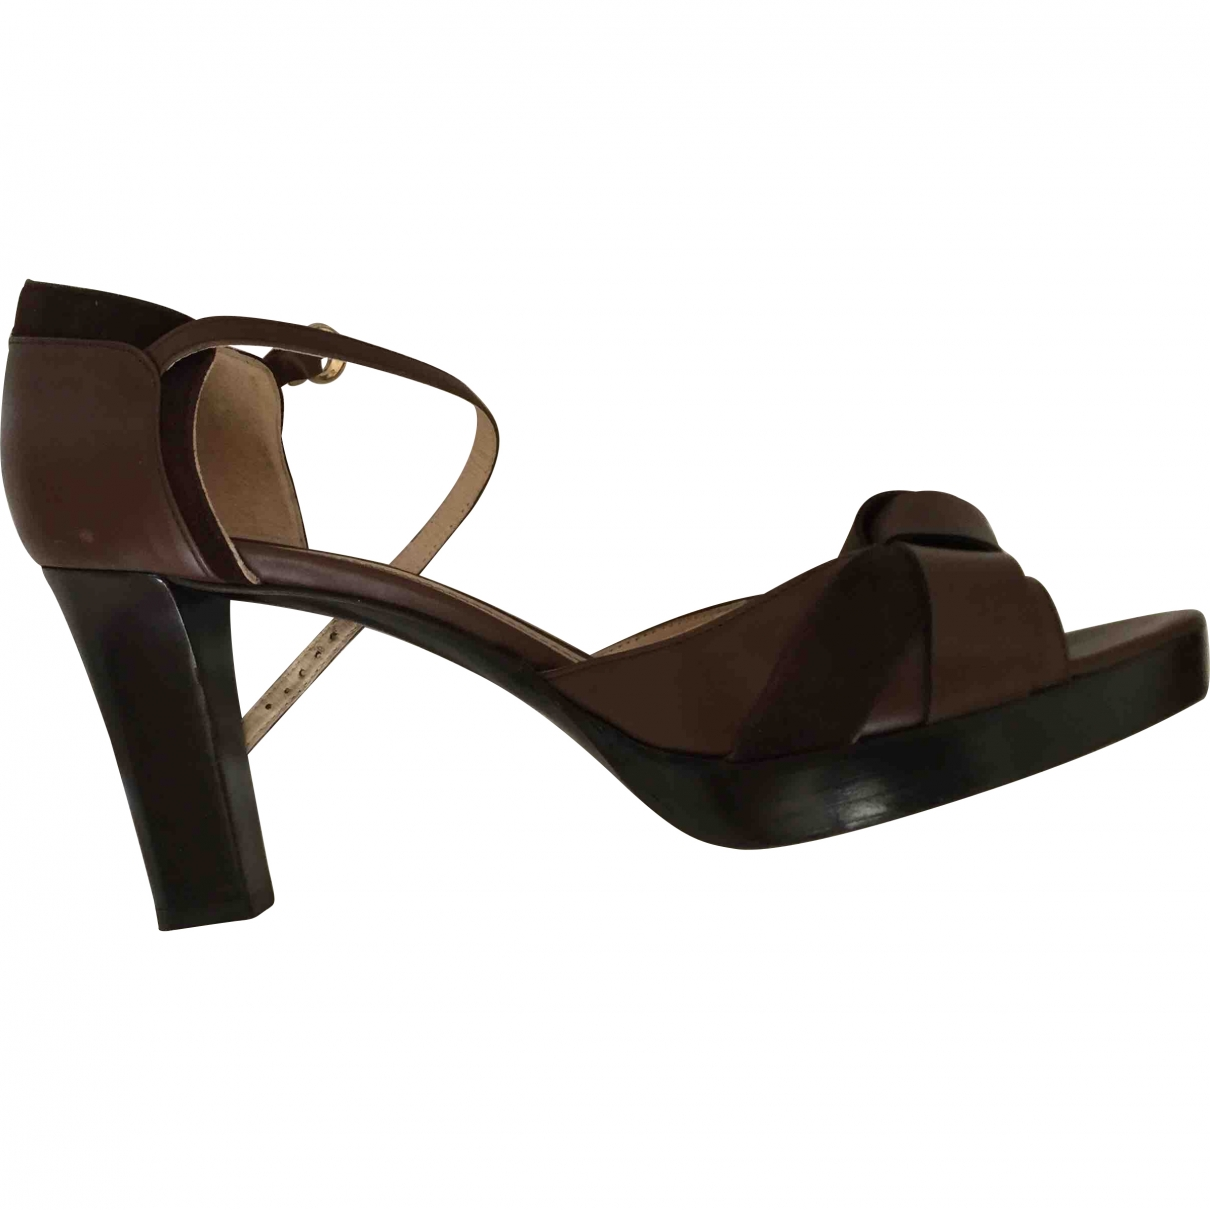 Max Mara \N Brown Leather Sandals for Women 40 EU